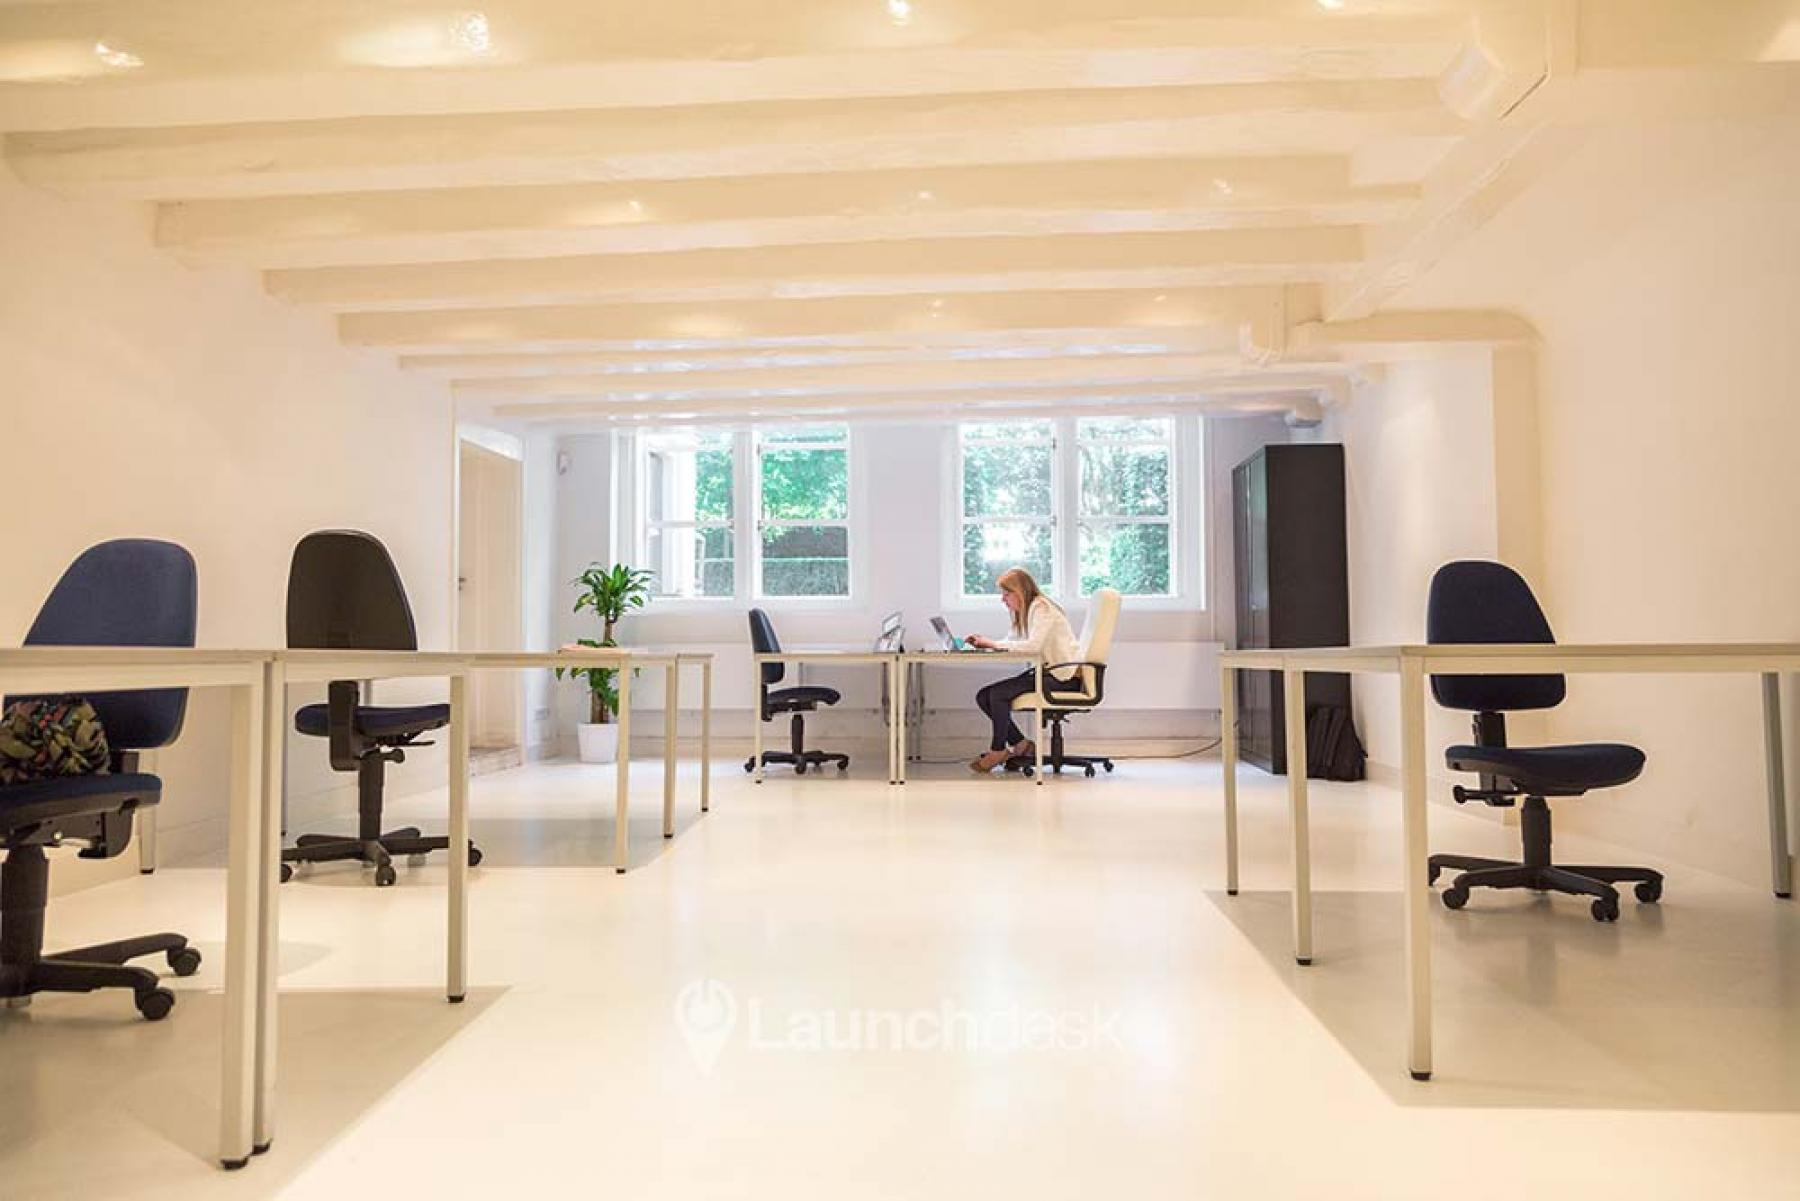 rent coworking office space in amsterdam centrum herengracht driekoningen 2494